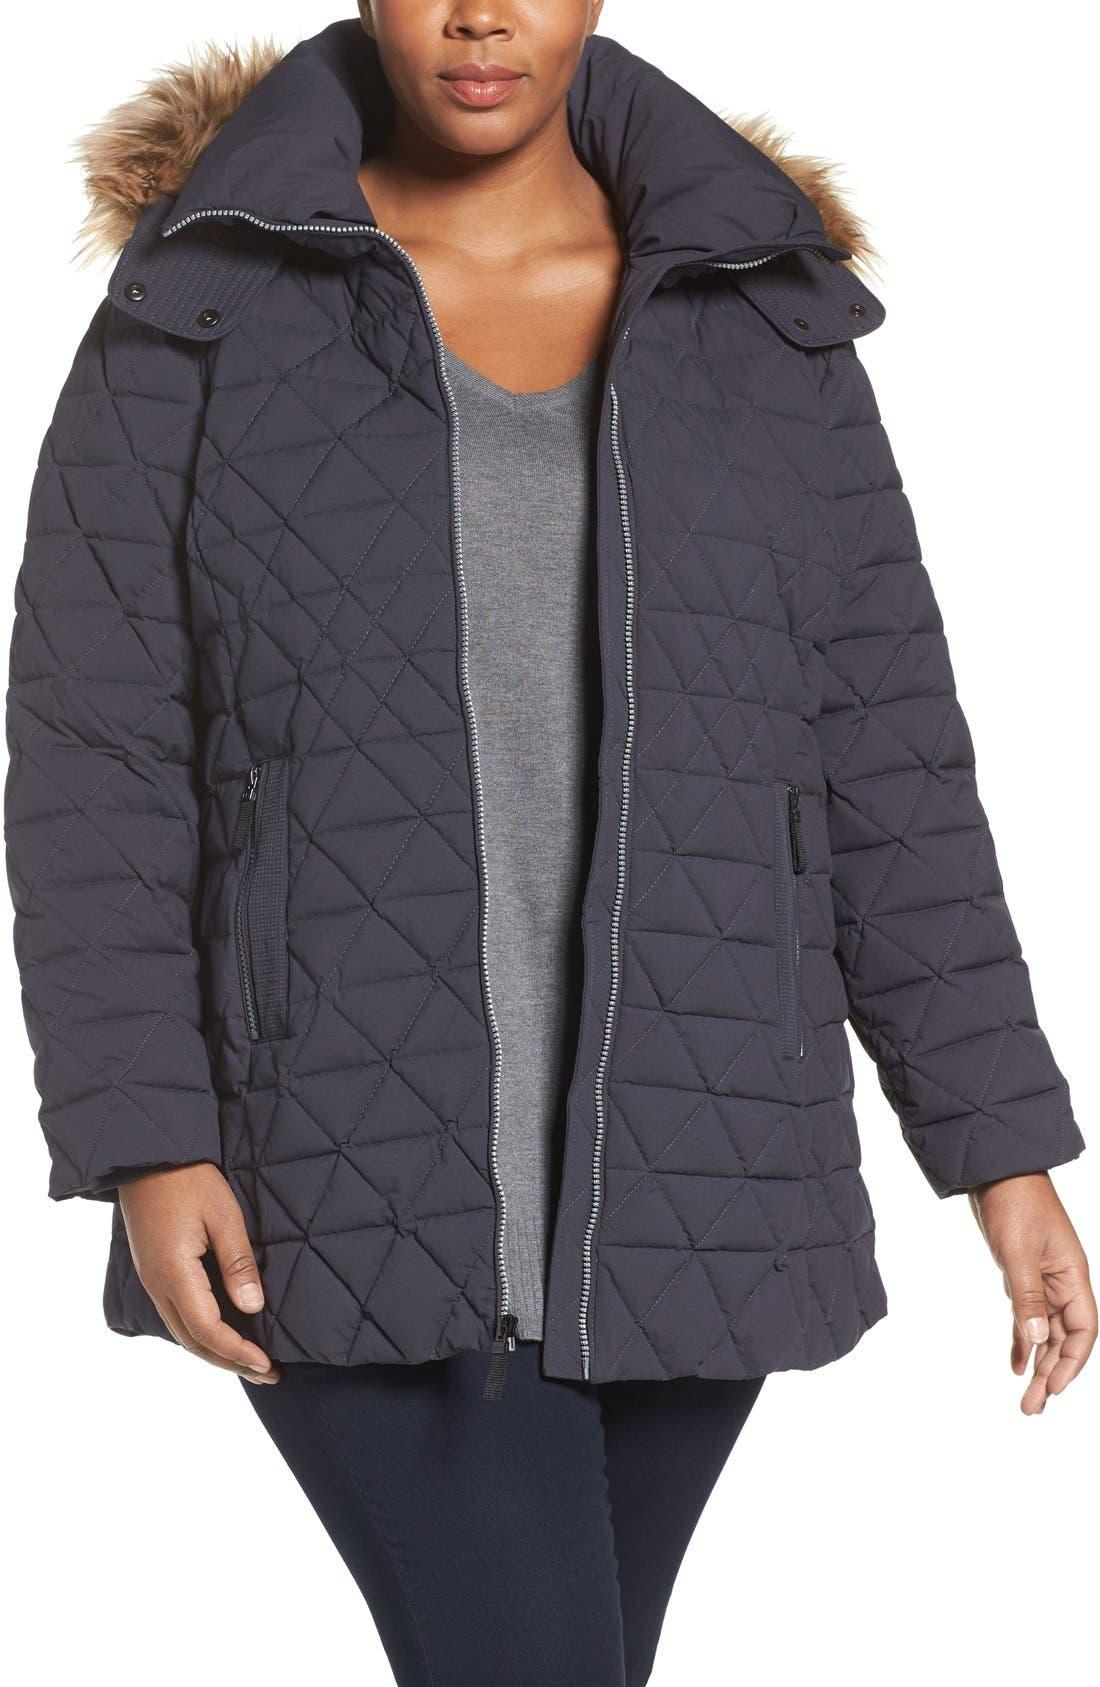 Andrew Marc Down Jacket with Faux Fur Trim Hood (Plus Size)